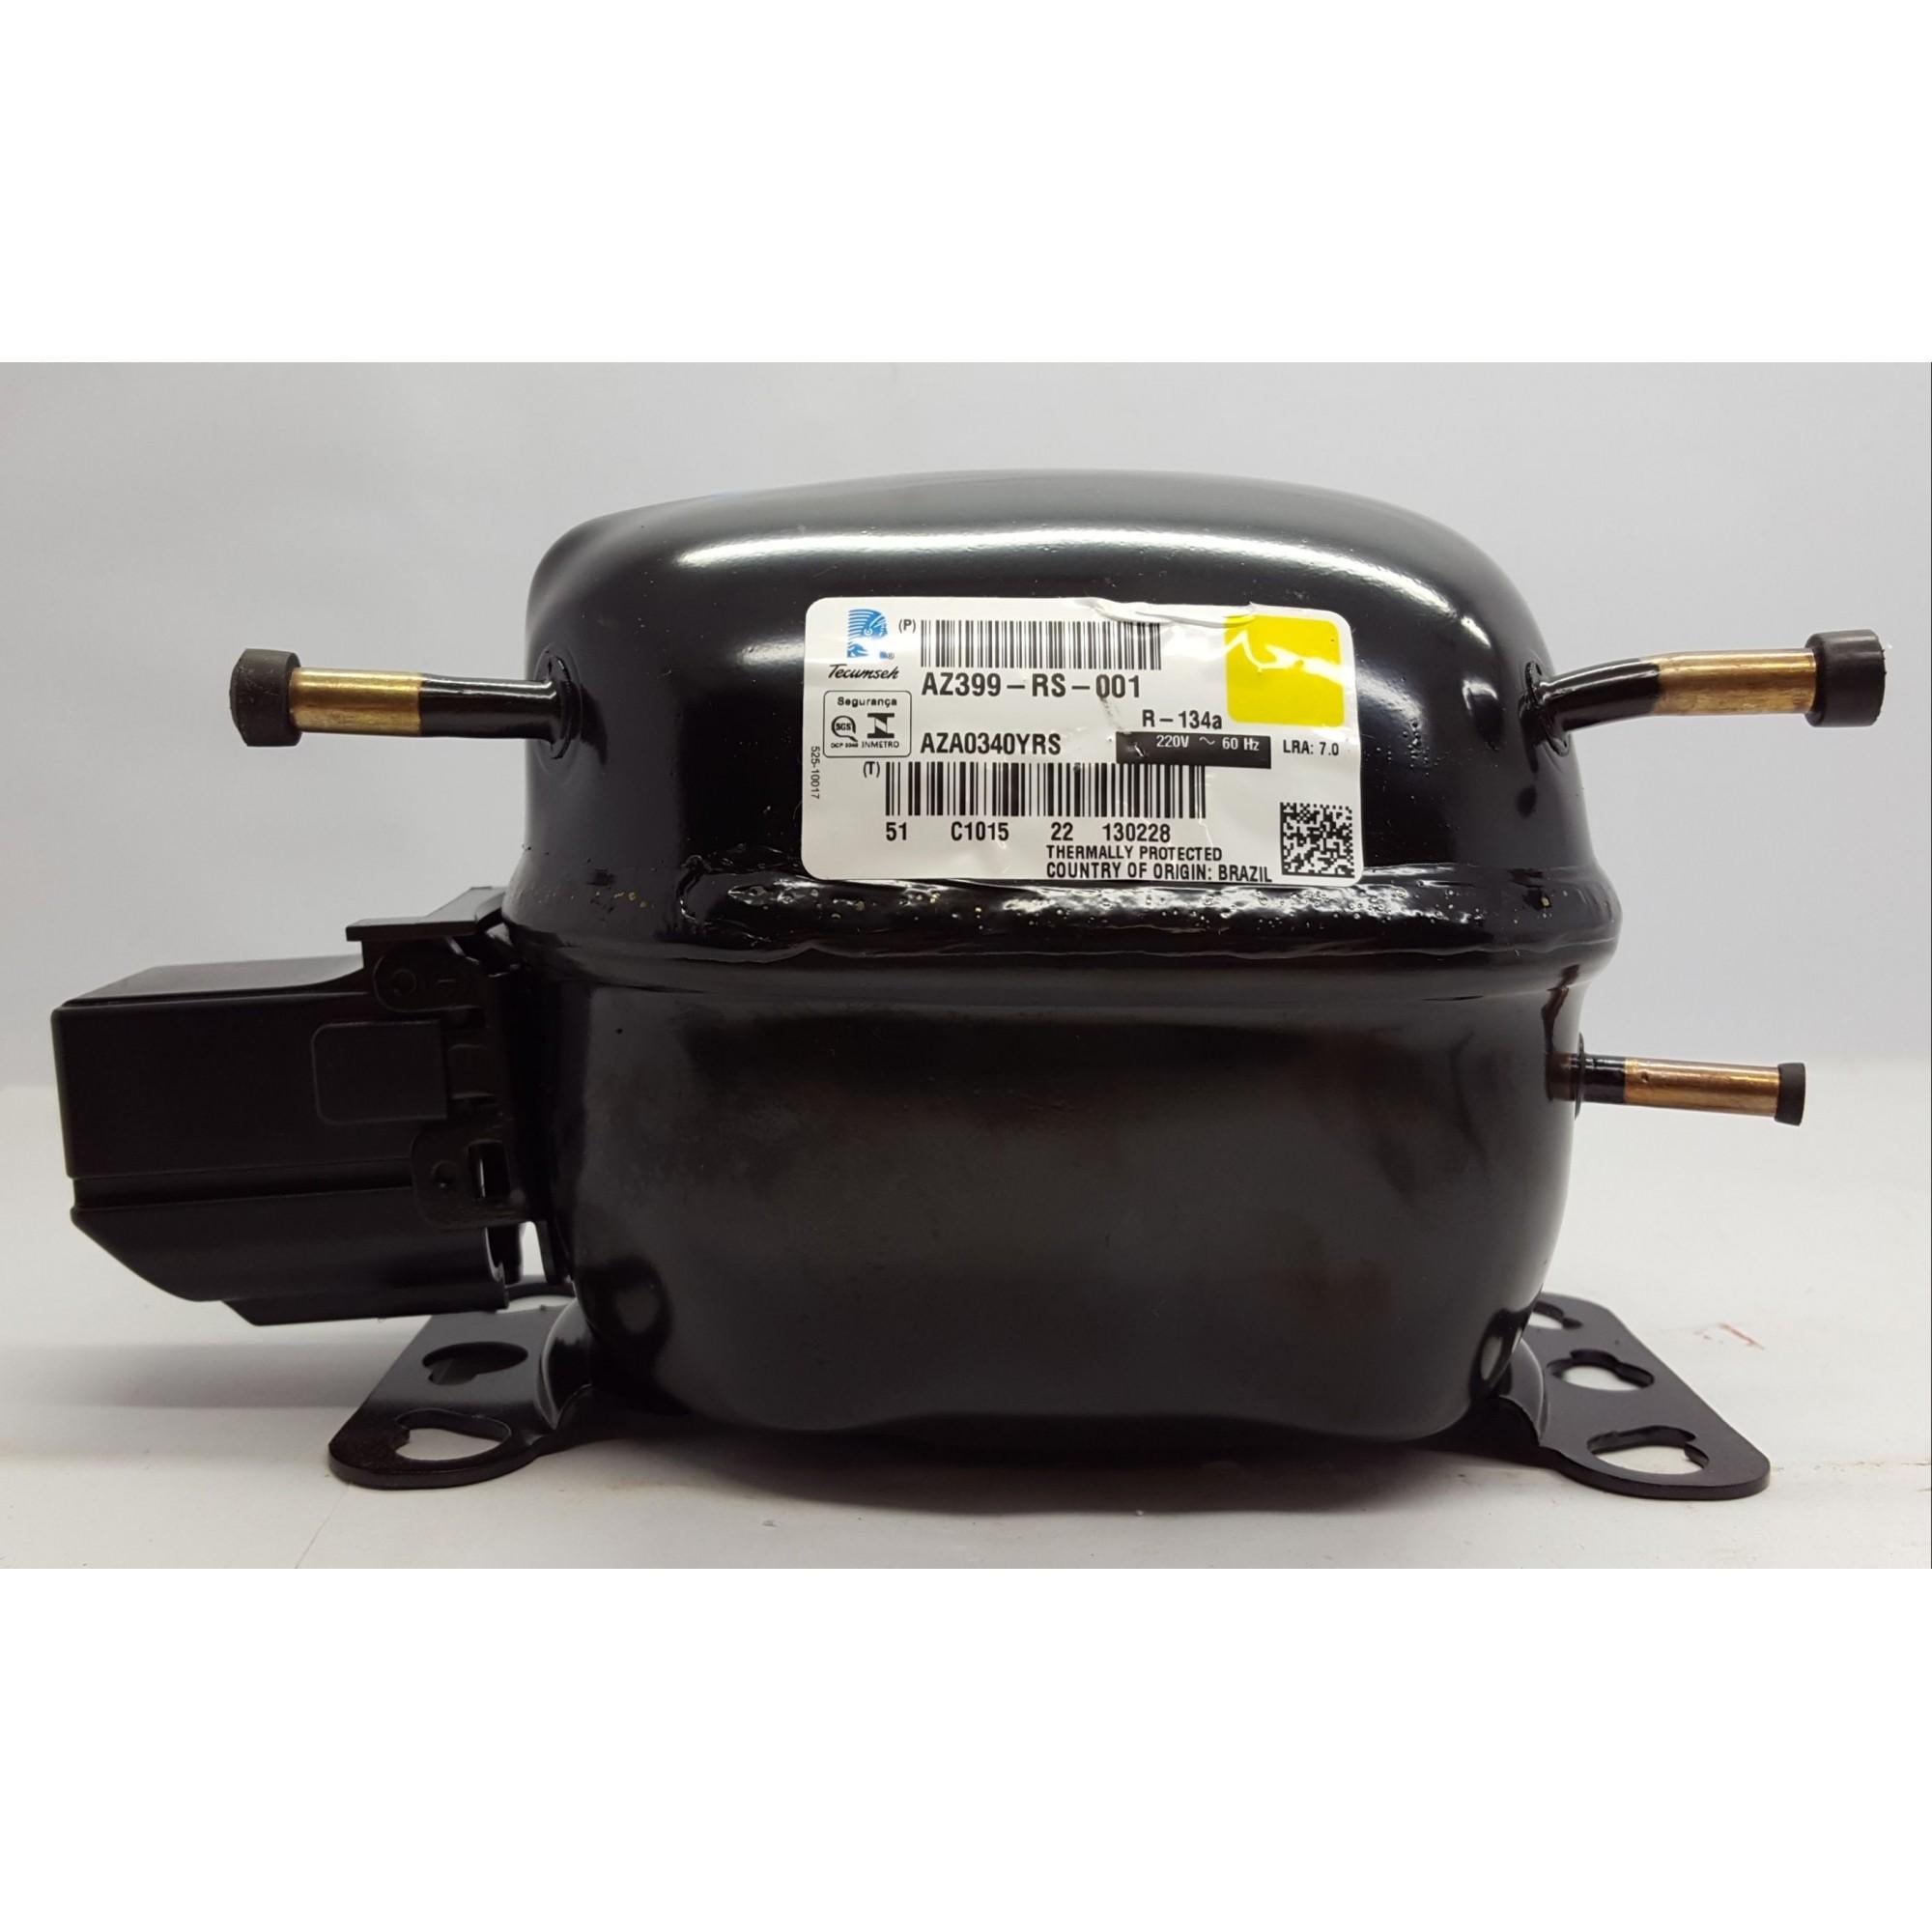 MOTOR COMPRESSOR TECUMSEH 1/12 HP - AZA0340YRS - R-134a (220v)